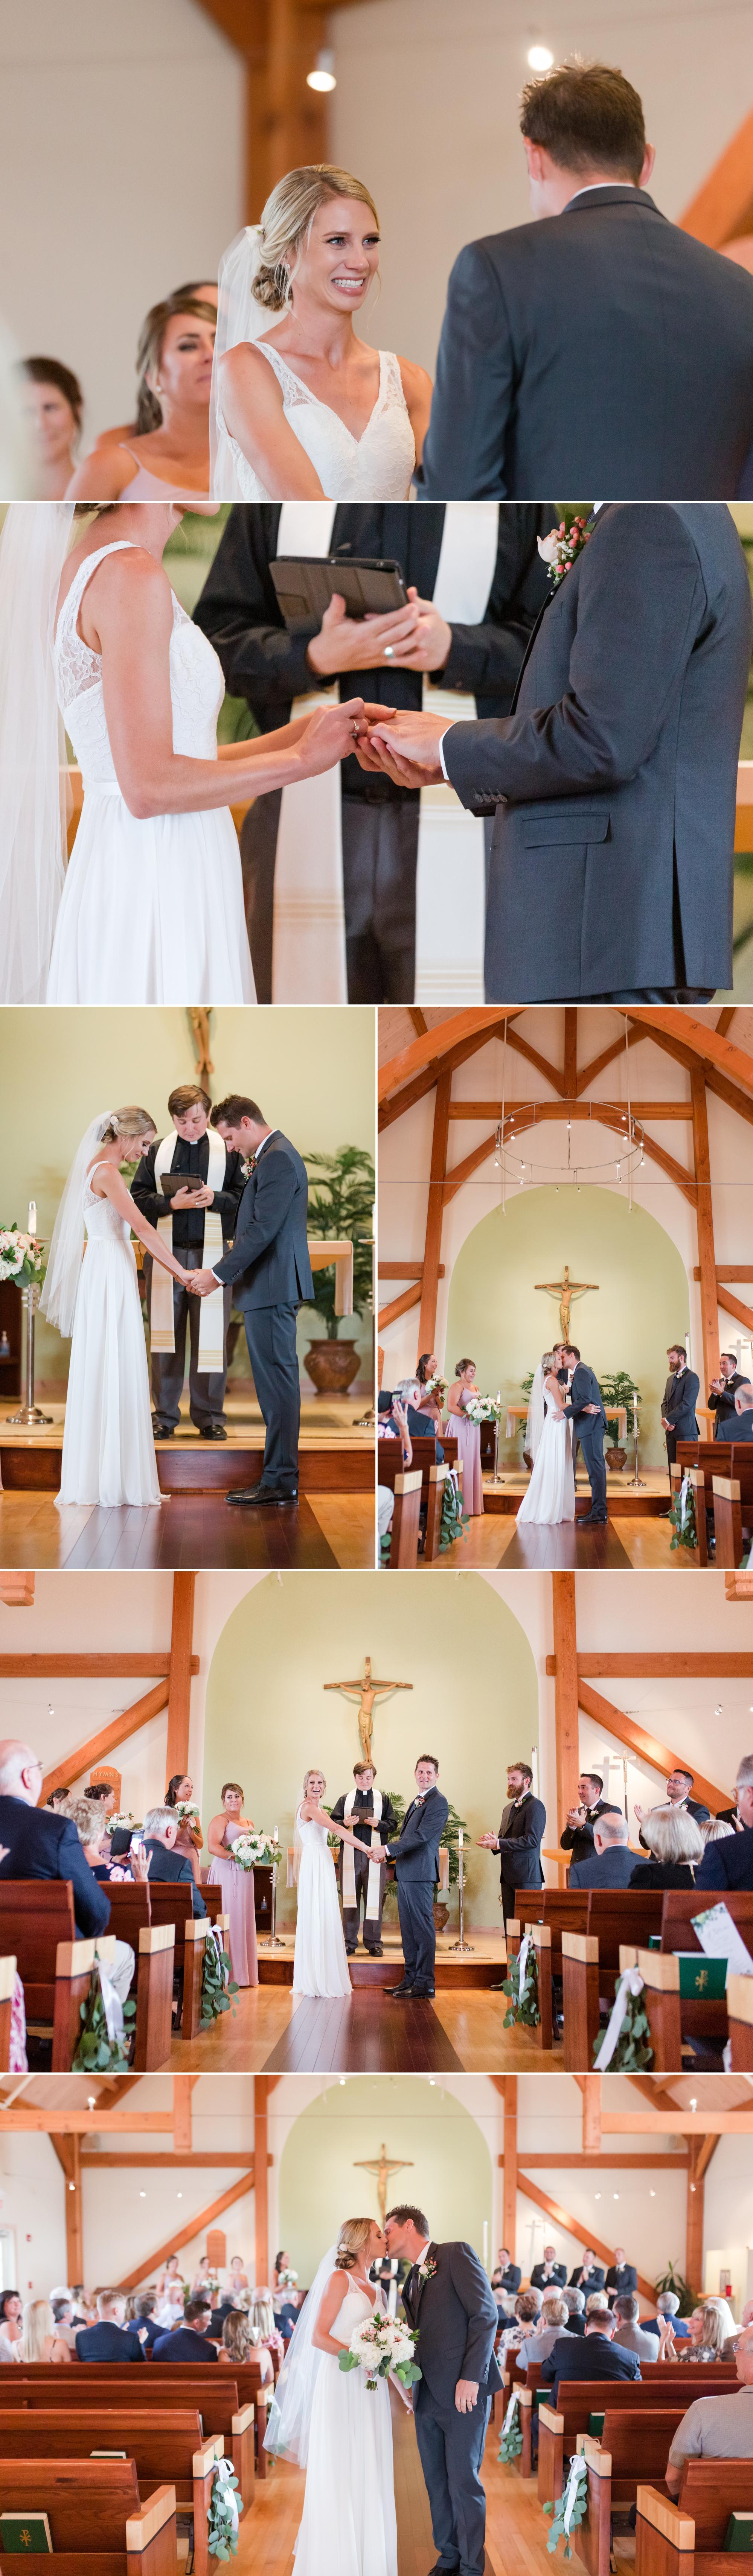 St. Bernard Chapel Wedding, Snowshoe Mountain Wedding, WV